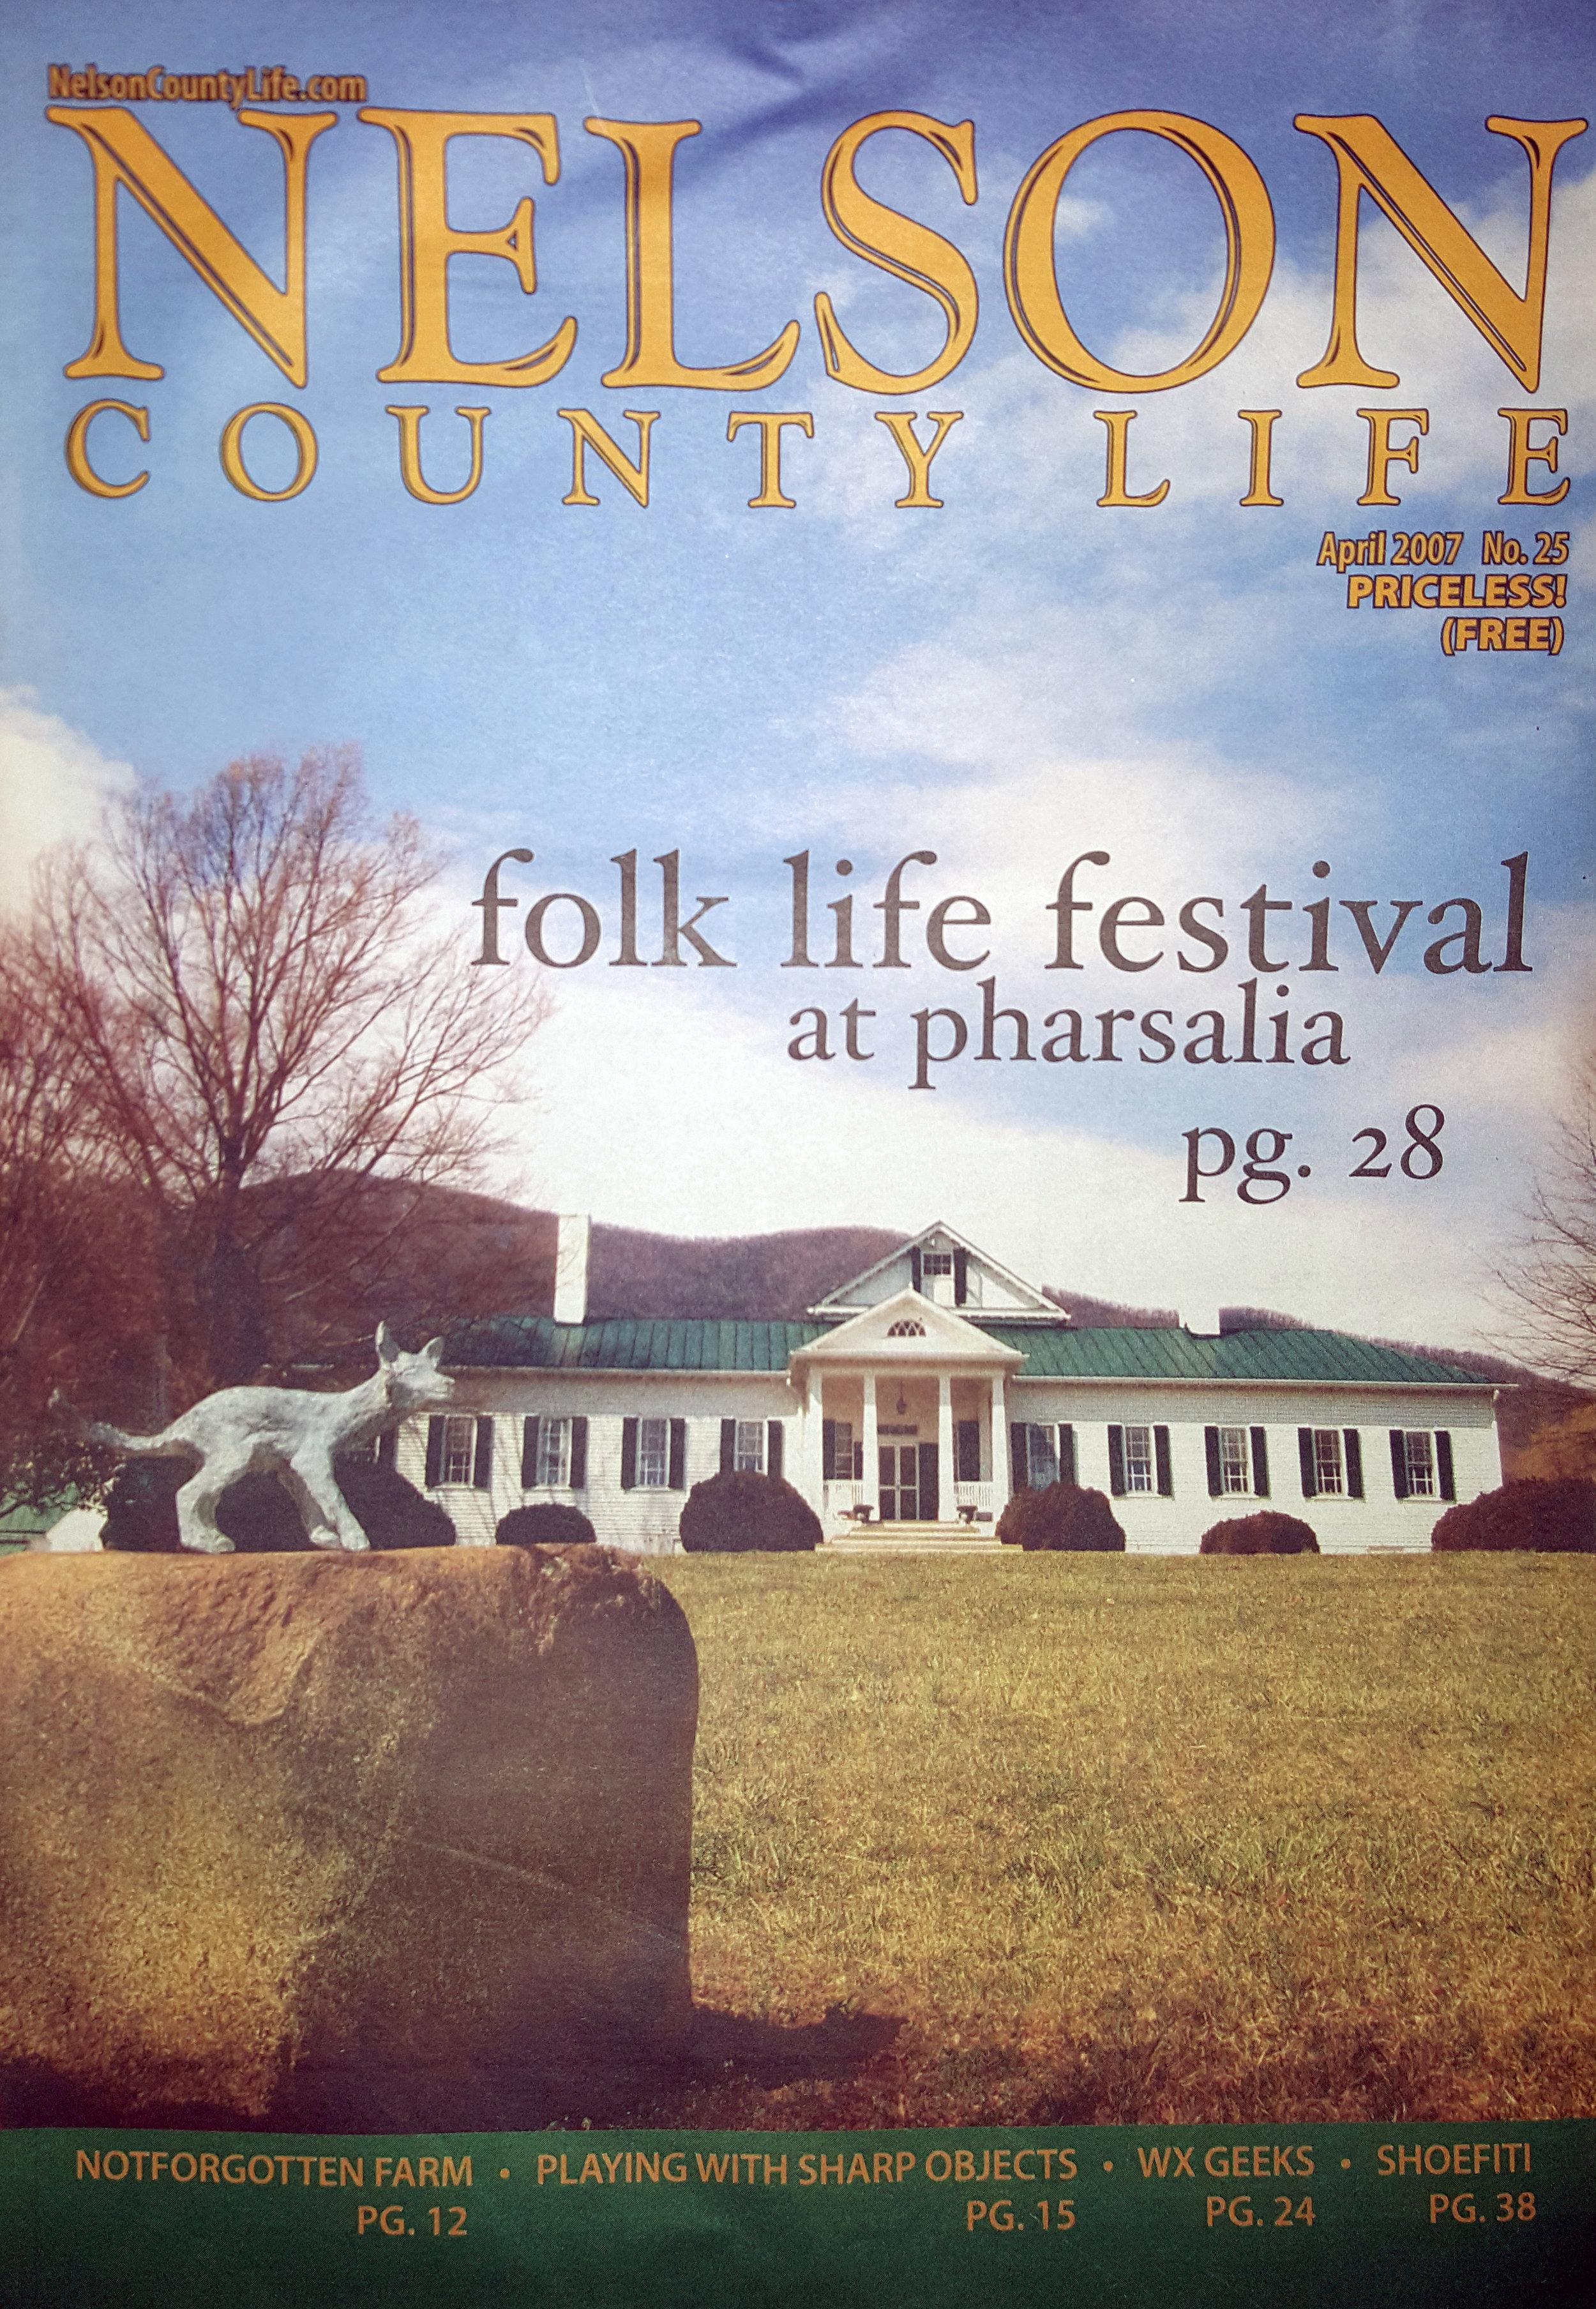 Nelson County Life.jpg